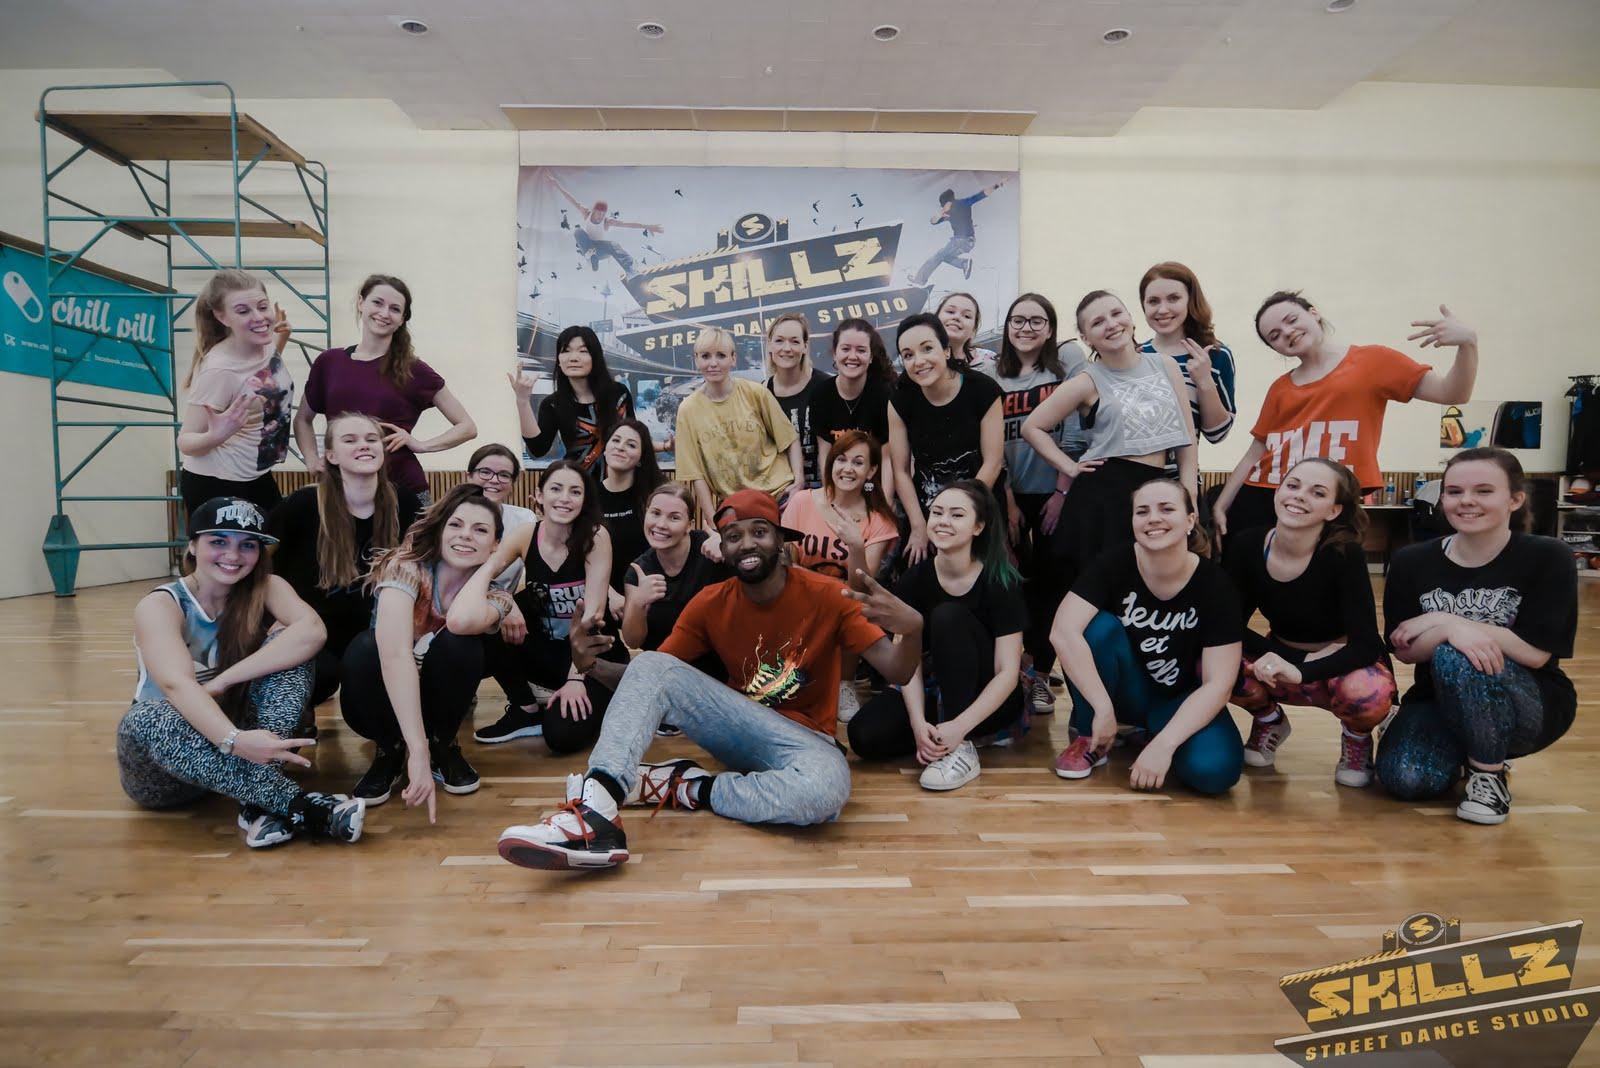 Jiff Di Bossman dancehall workshop - P1000777.jpg